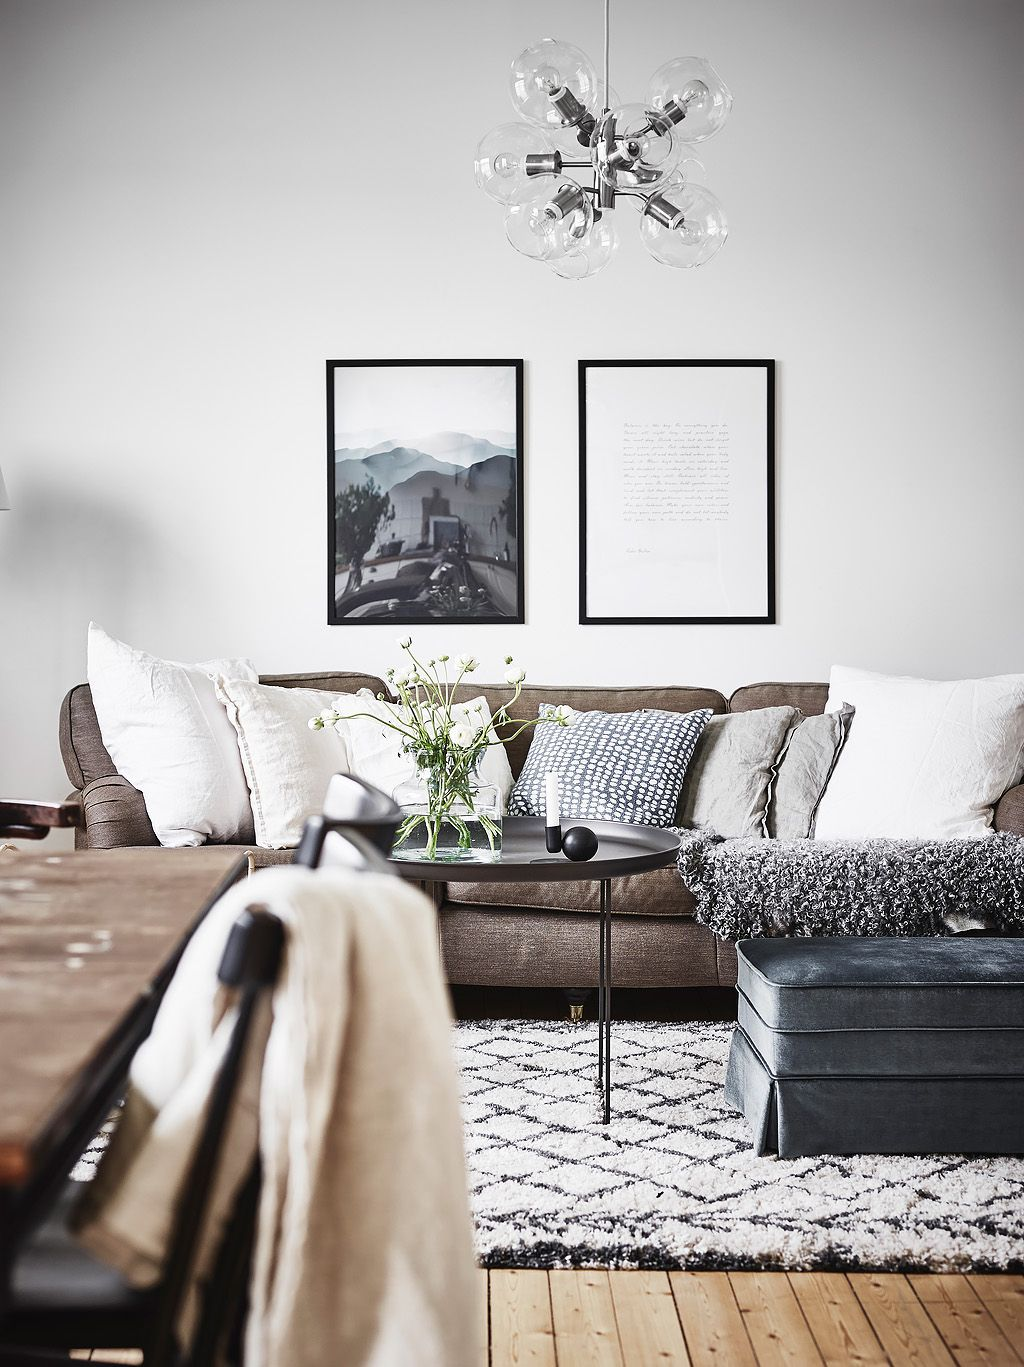 Entrance Fastighetsmäkleri  #interior #home #style #design #sekelskifts #modernt #detaljer